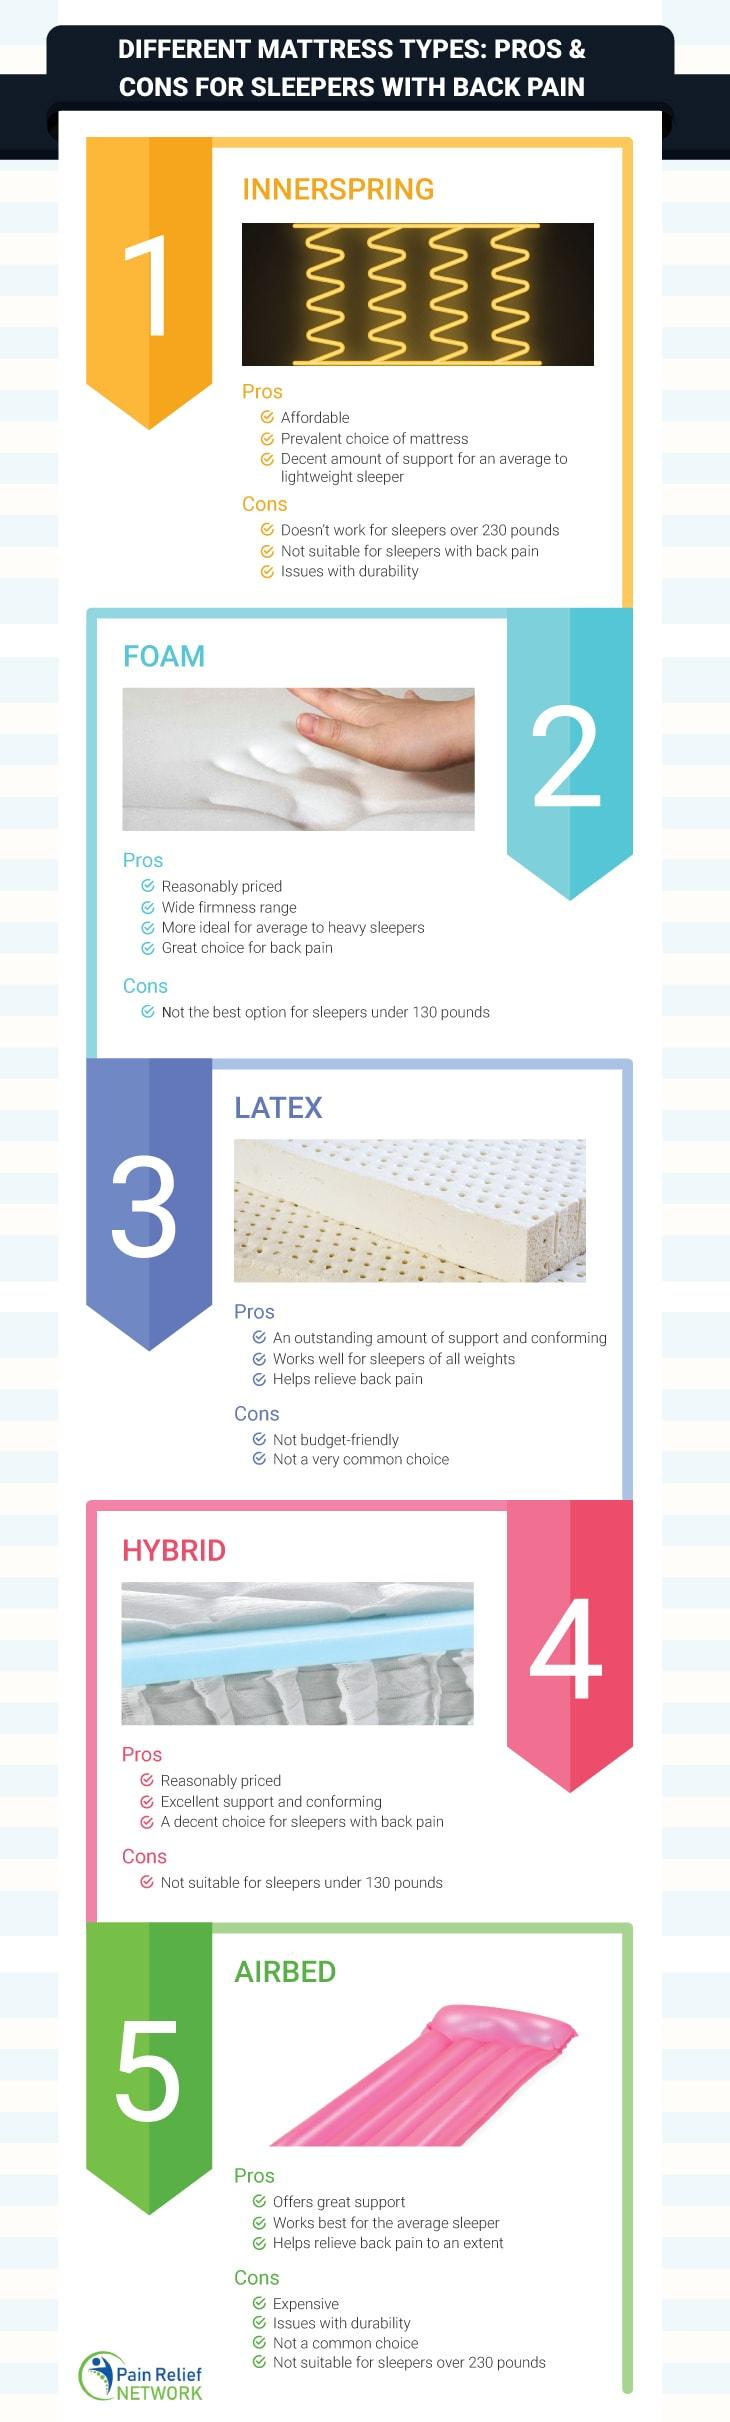 Different Mattress Types